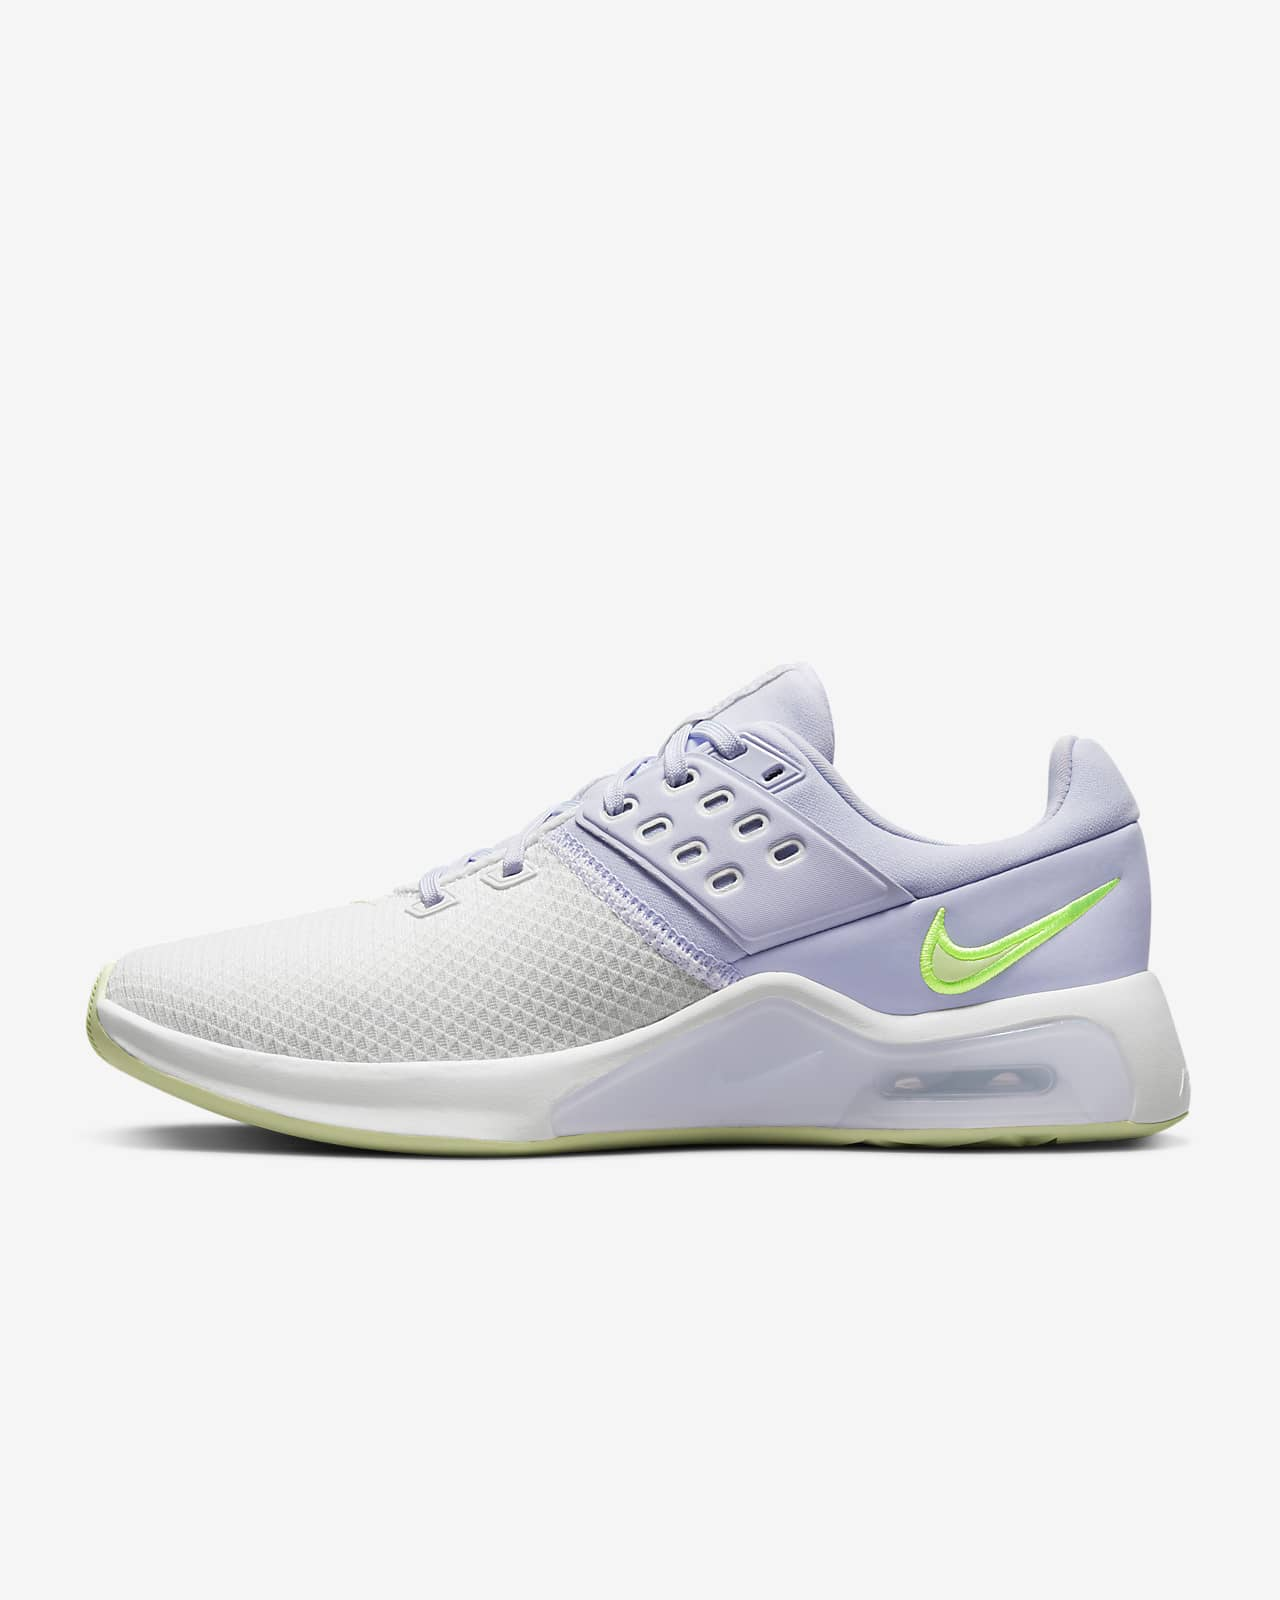 Nike Air Max Bella TR 4 Women's Training Shoes